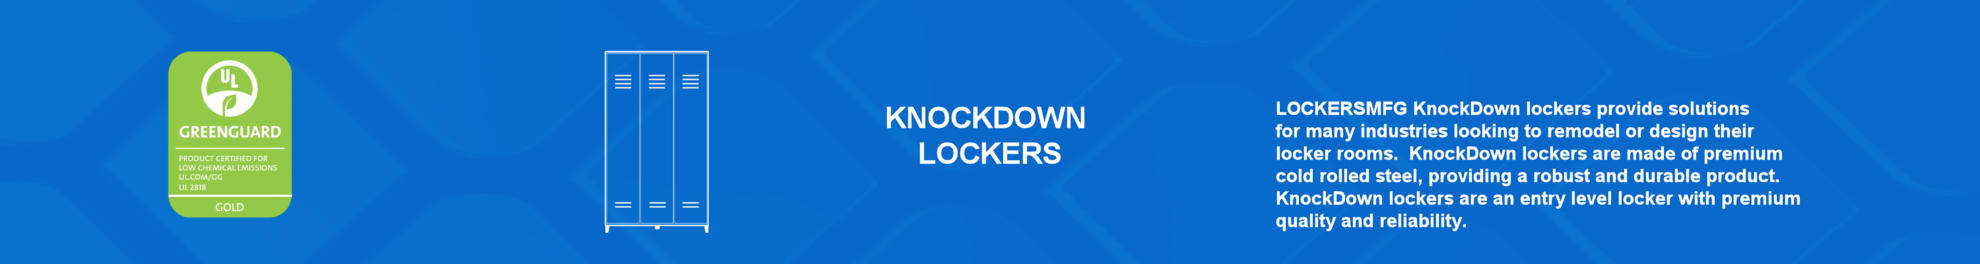 Knock Down DiamondBackground